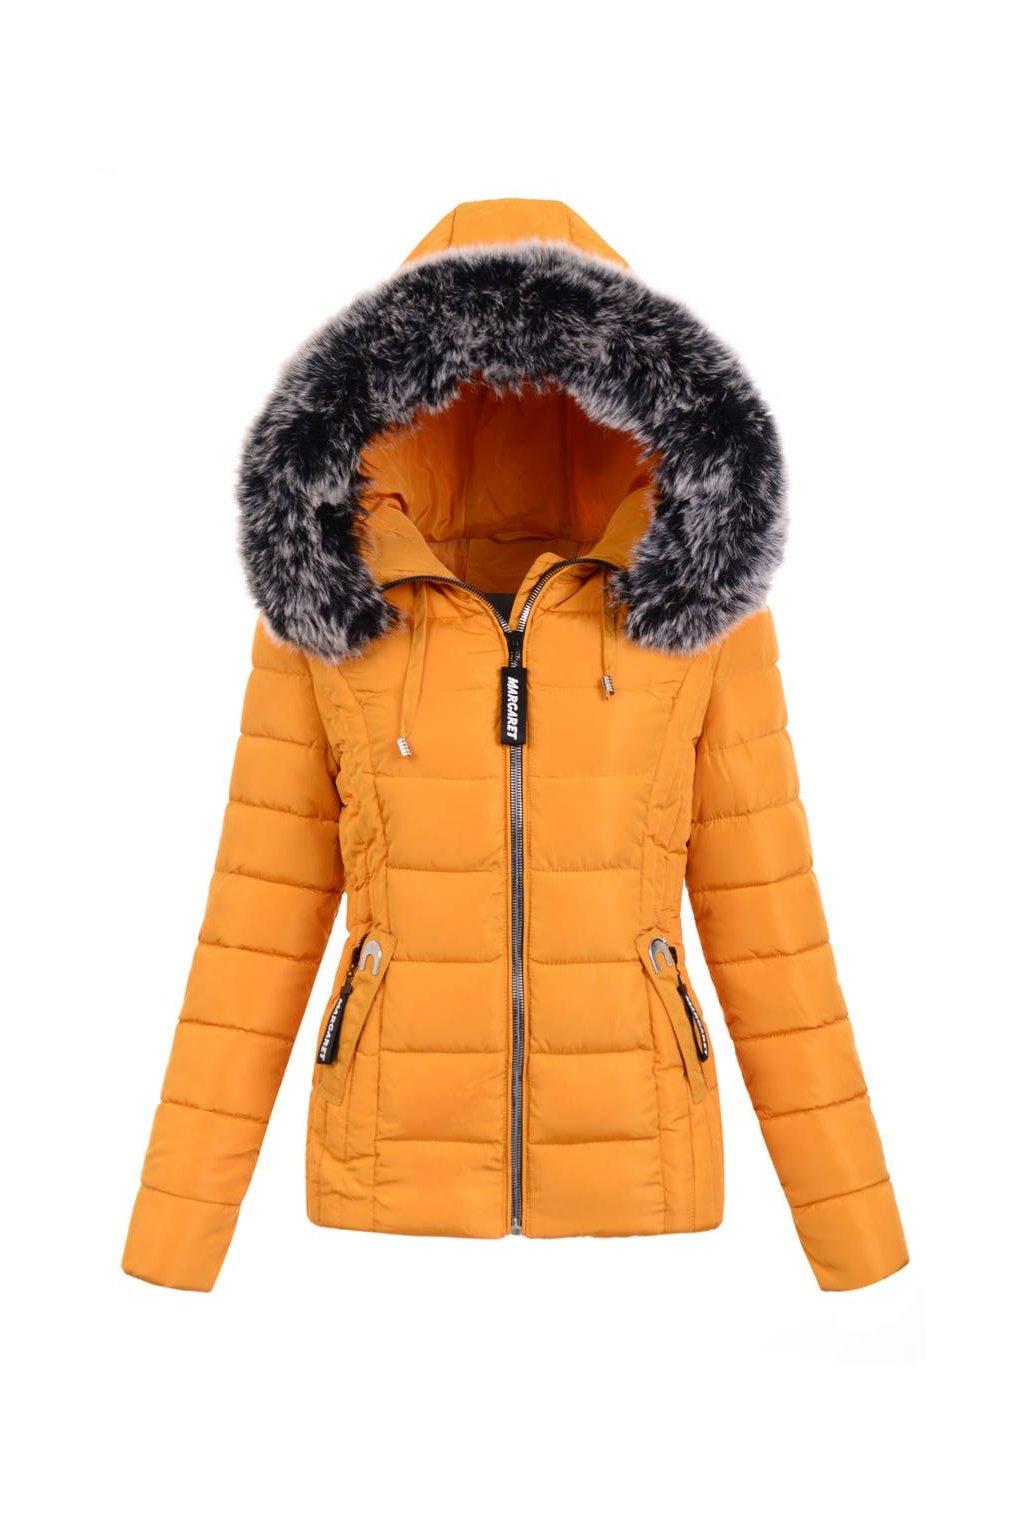 Dámska zimná bunda s kapucňou 5132 žltá